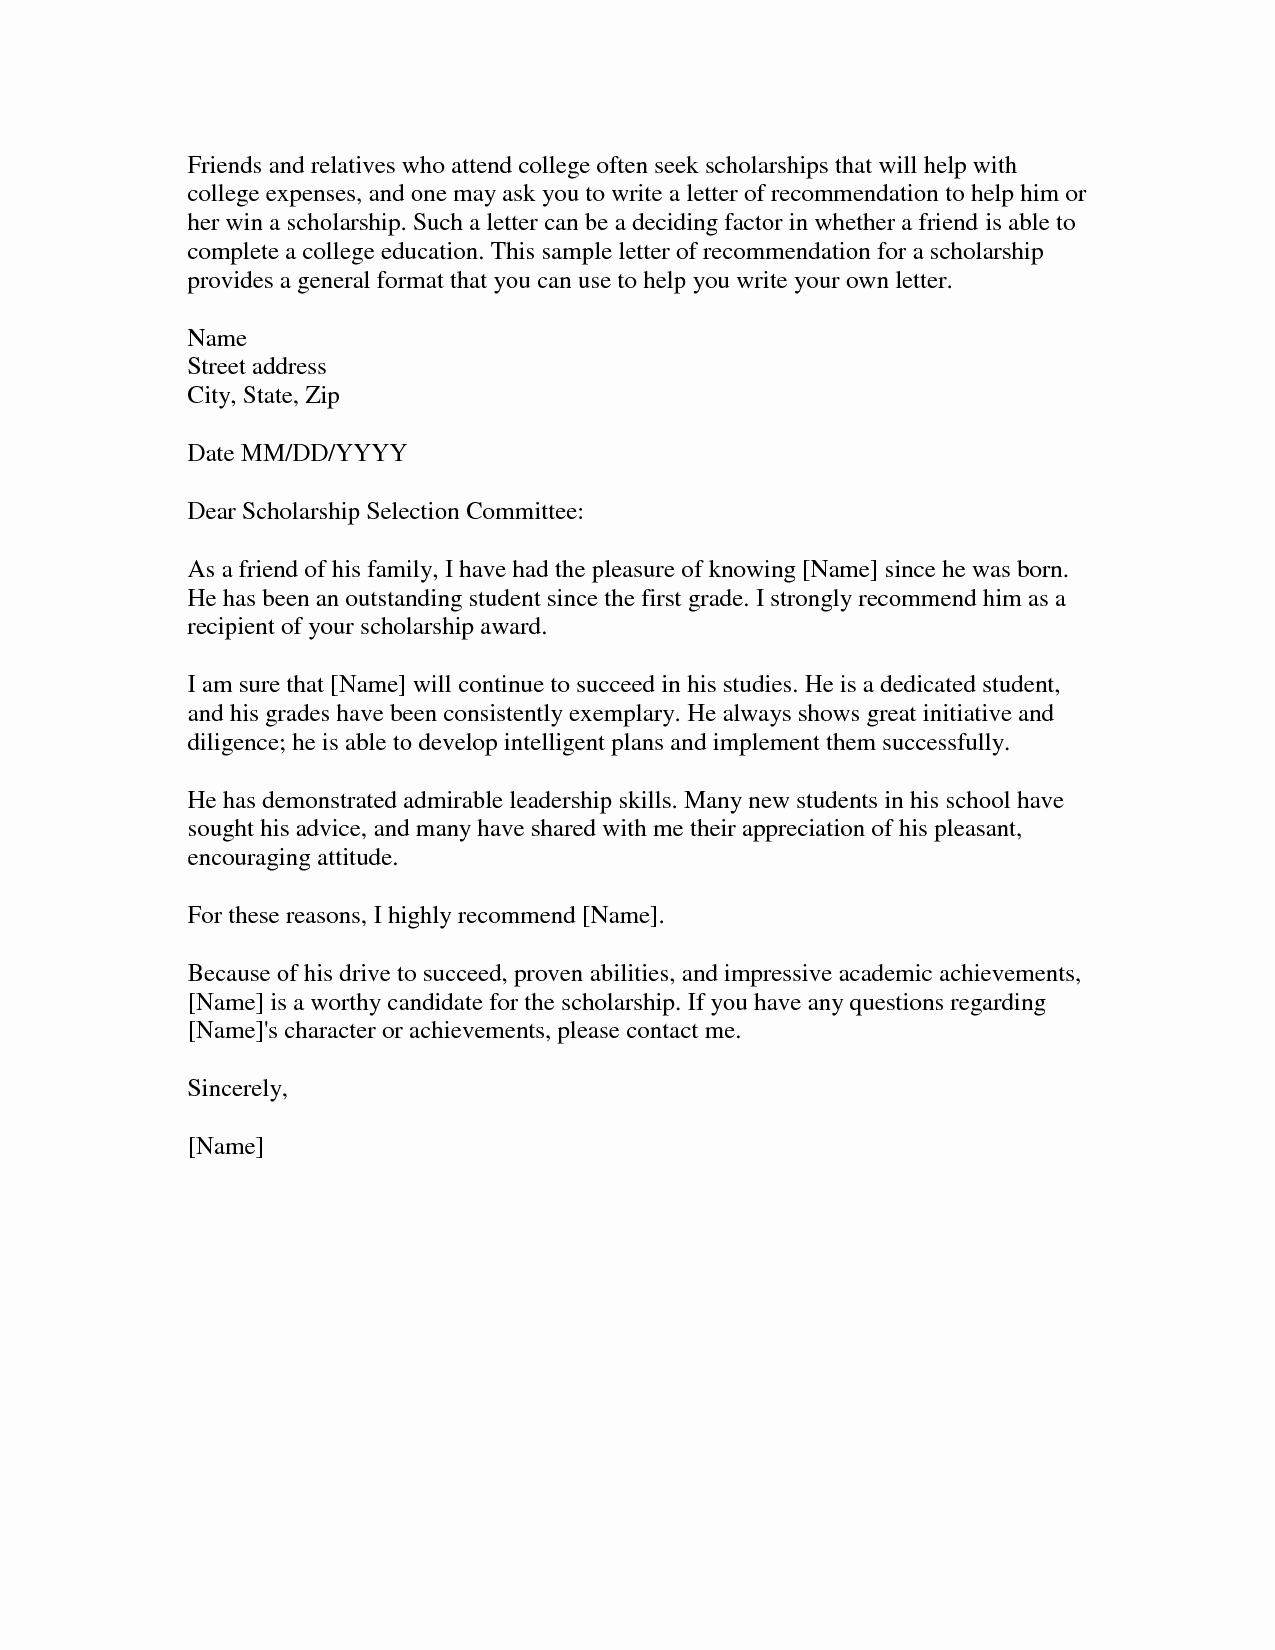 Letter format to A Friend Unique Download Scholarship Re Mendation Letter Sample Word